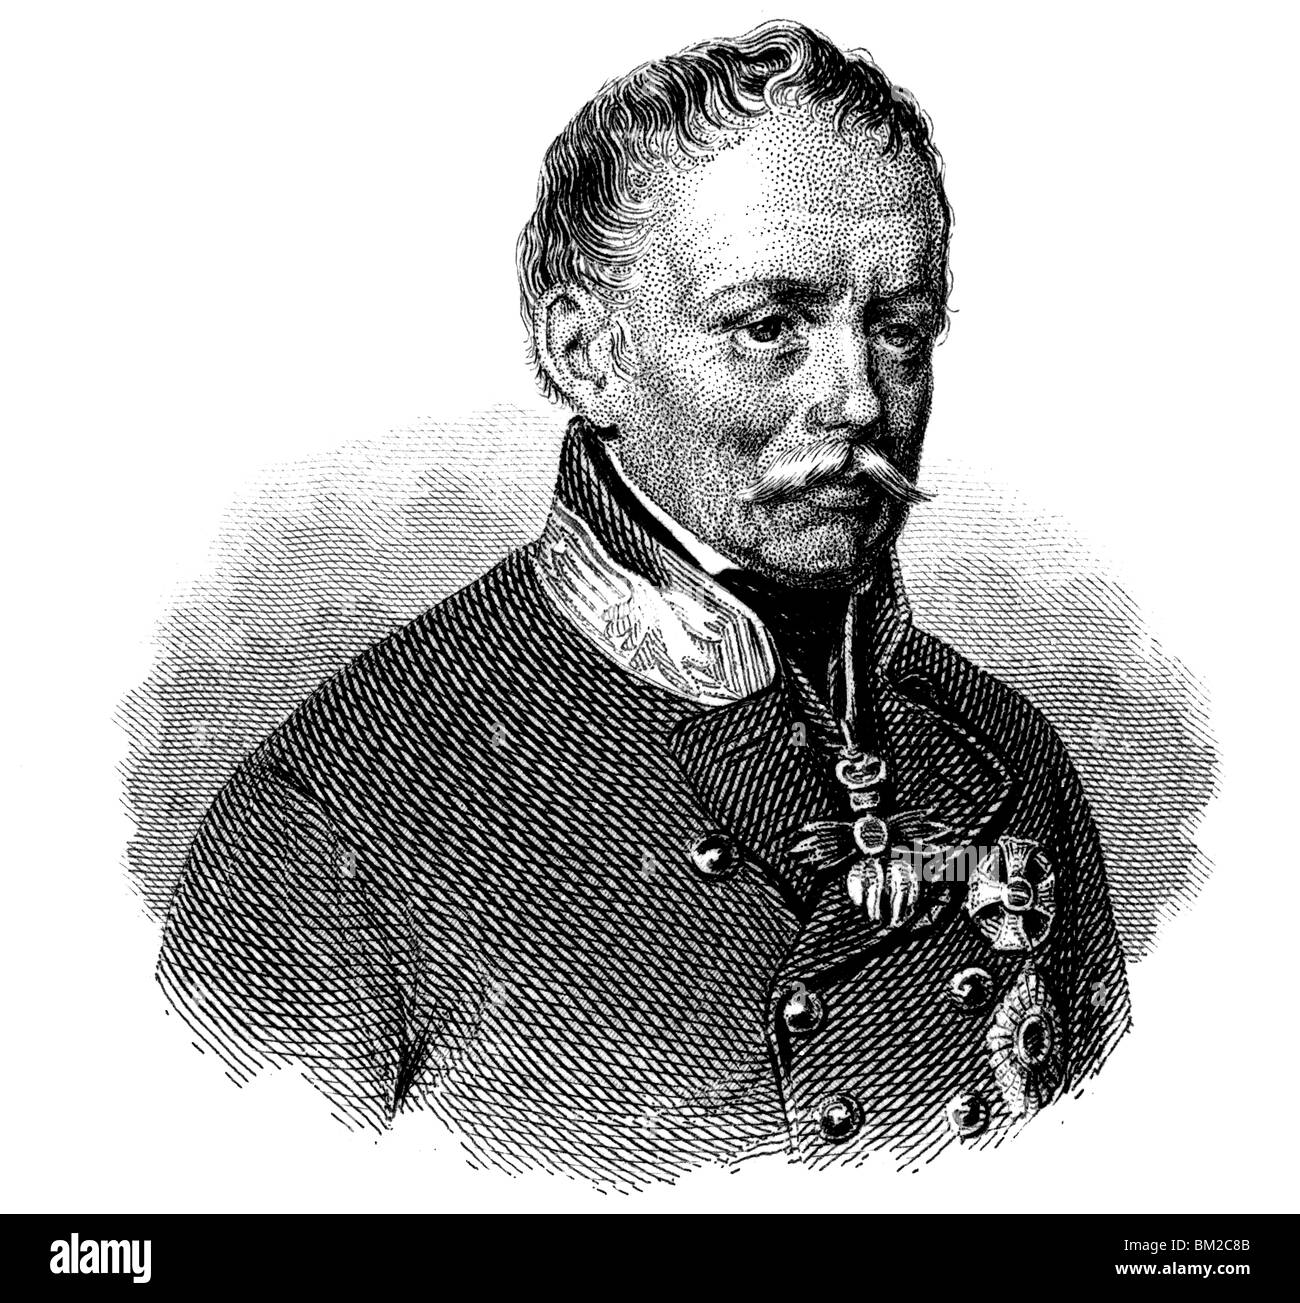 Joseph Radetzky von Radetz - Stock Image